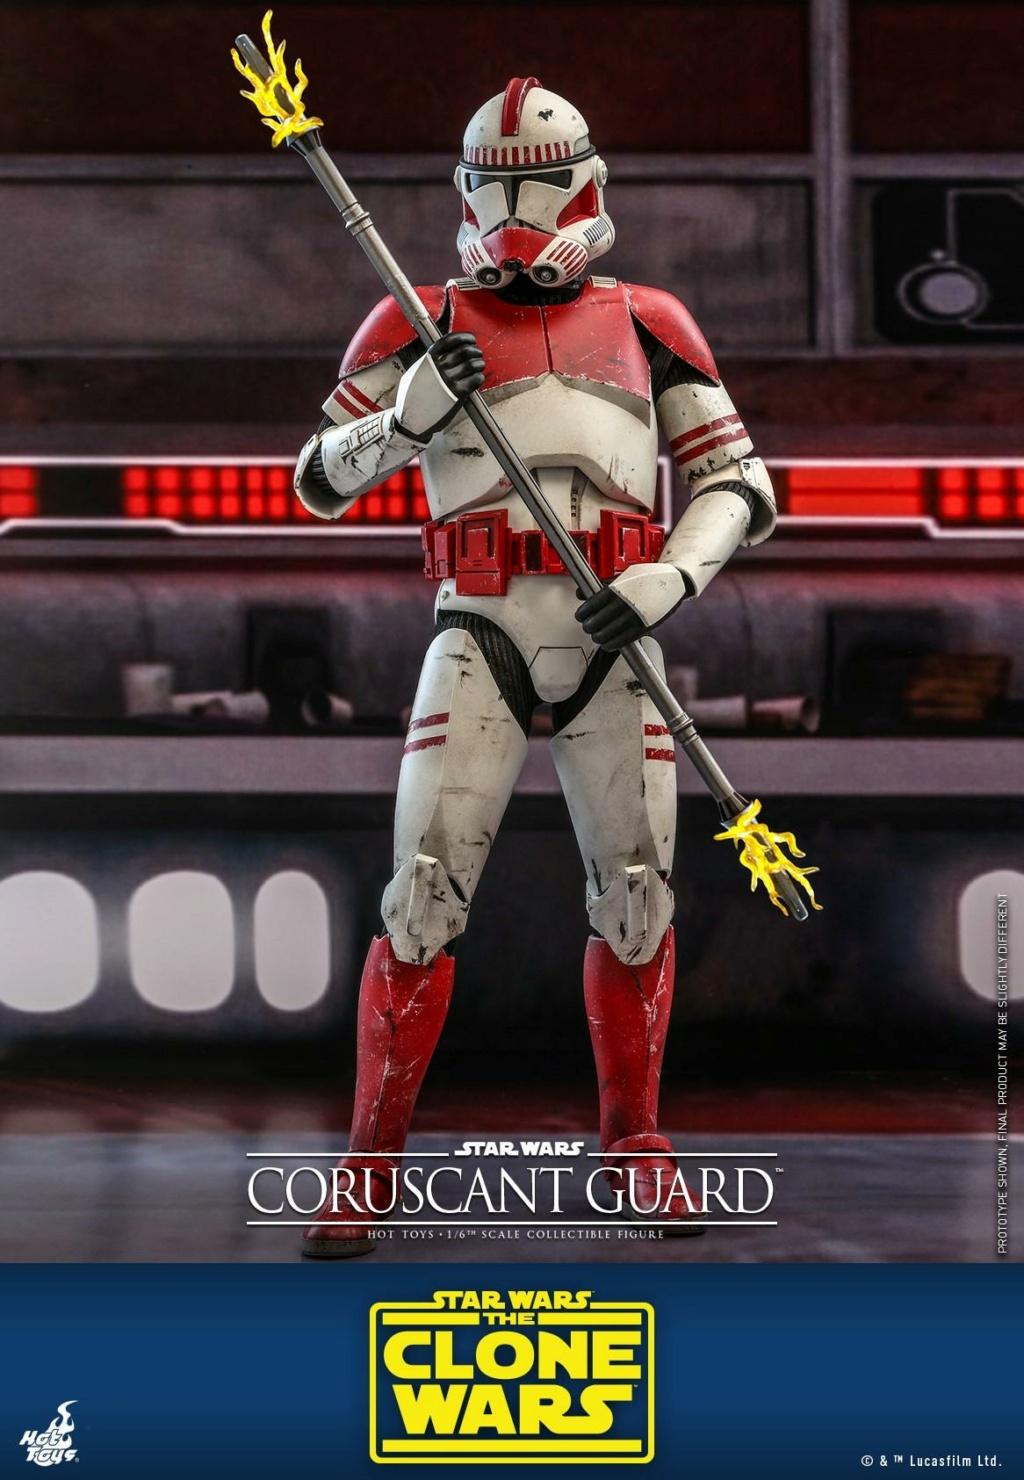 Coruscant Guard - 1/6th Figure - The Clone Wars - Hot Toys Corusc13